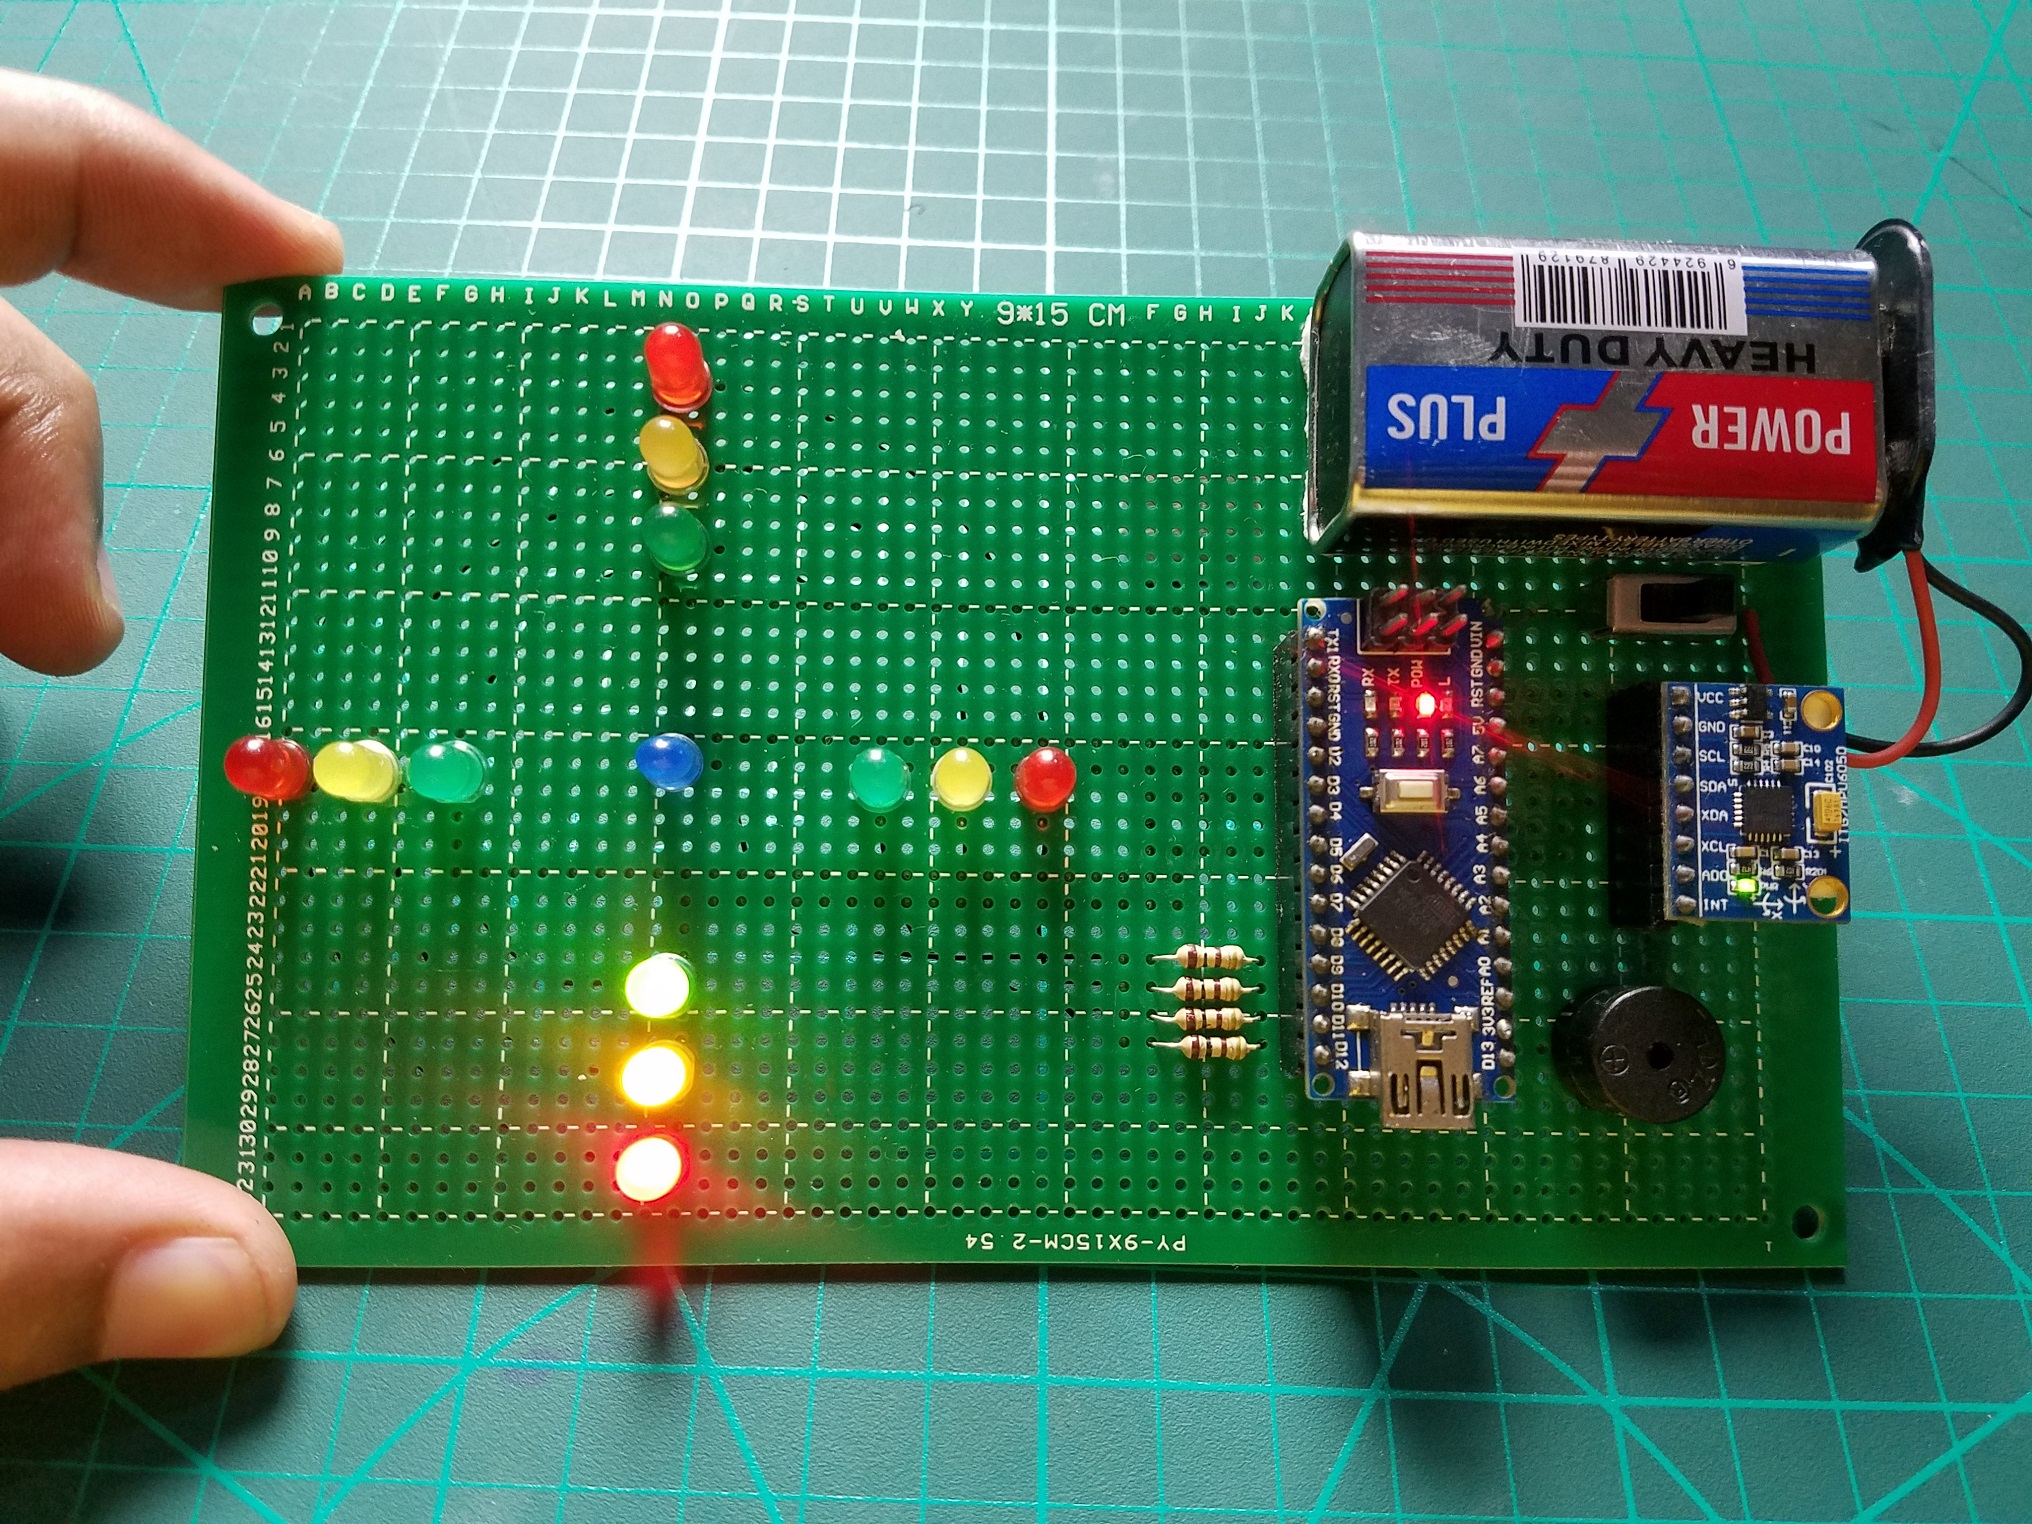 How to make a led spirit level with mpu6050 lfszwen0jq